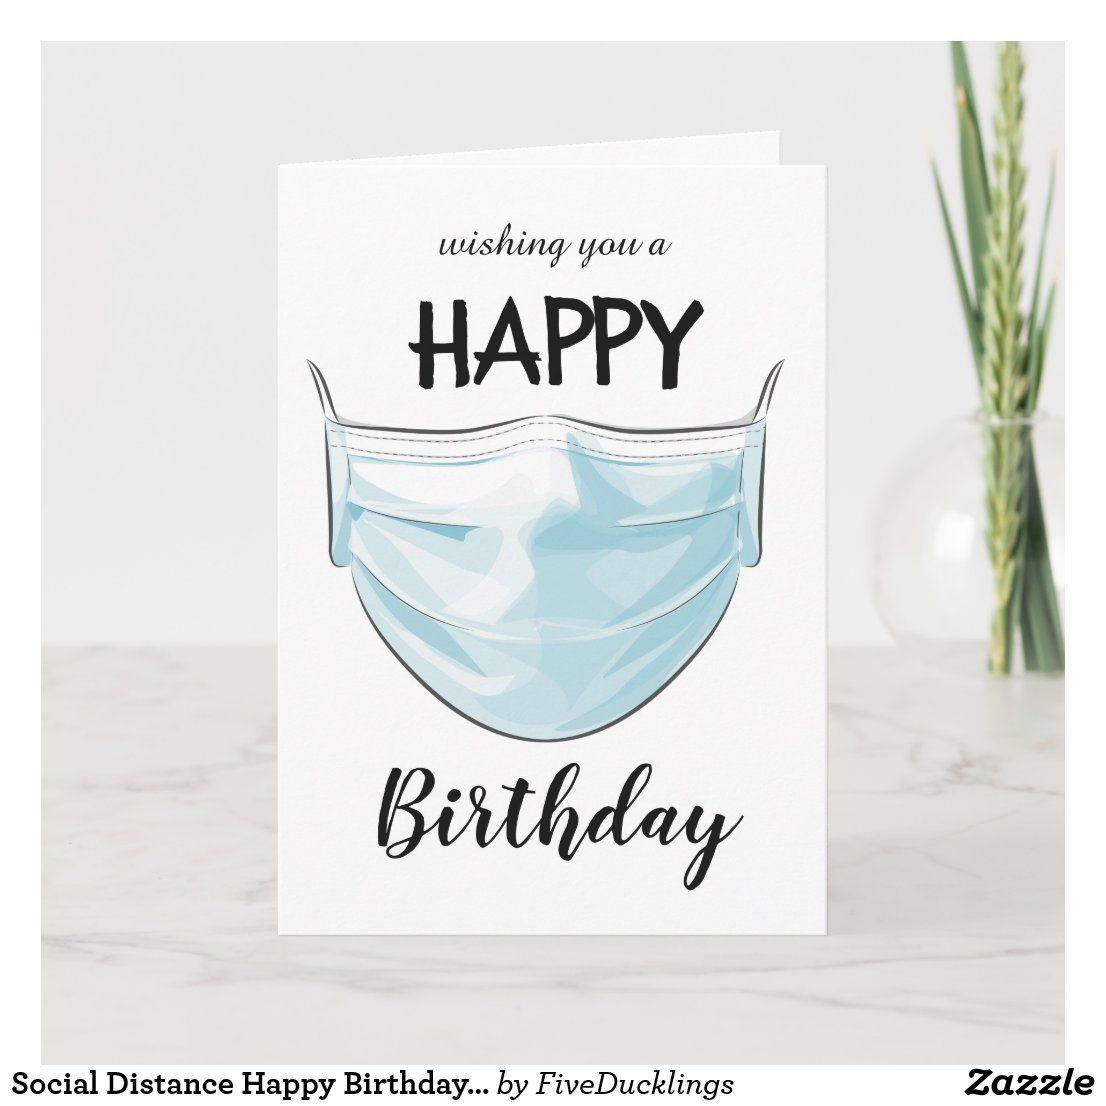 Social Distance Happy Birthday Card Zazzle Com In 2021 Happy Birthday Signs Happy Birthday Cards Happy Birthday Card Funny